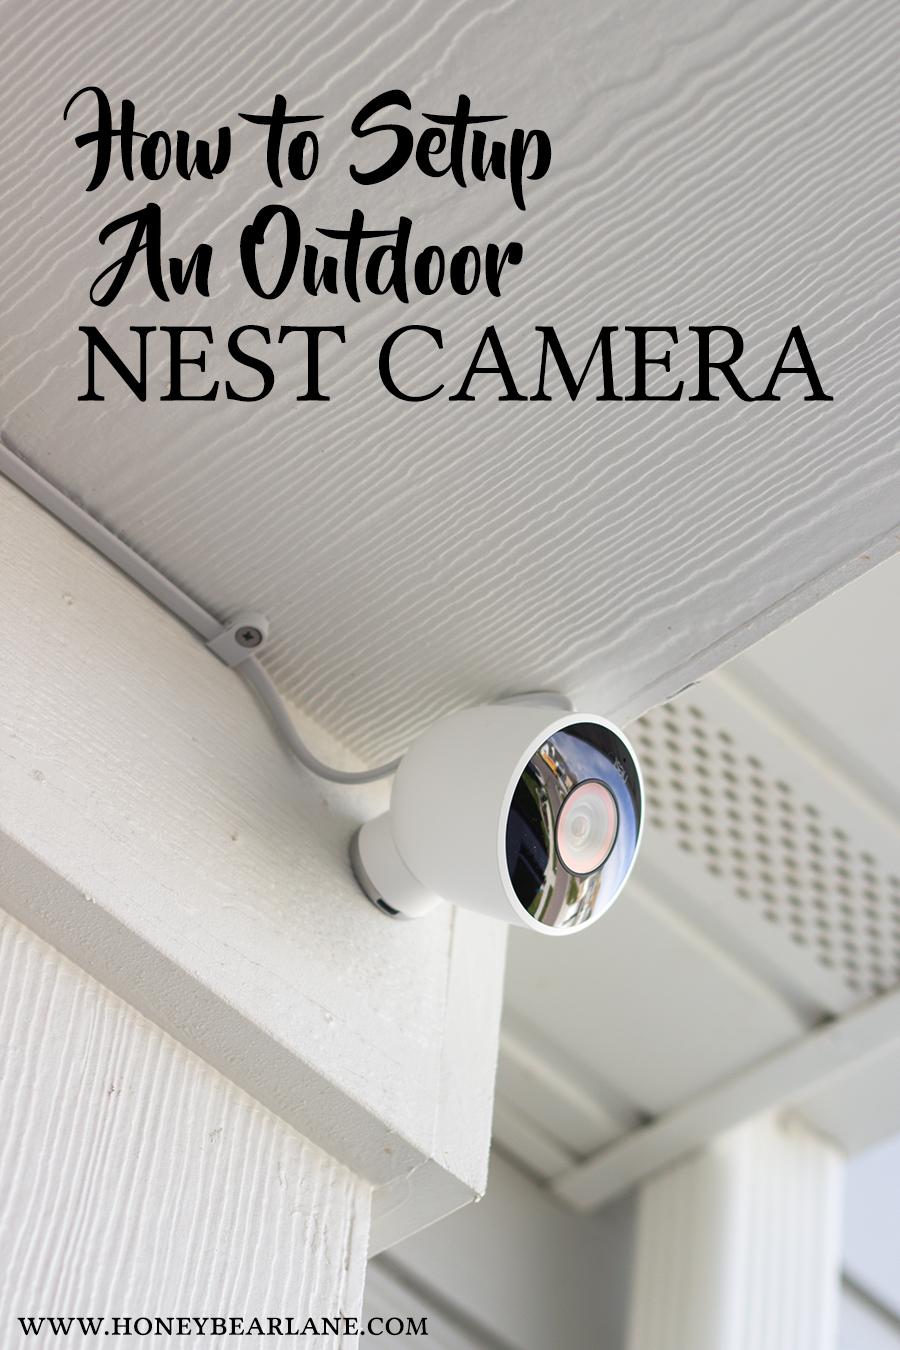 Smart Home Series How To Setup An Outdoor Nest Camera